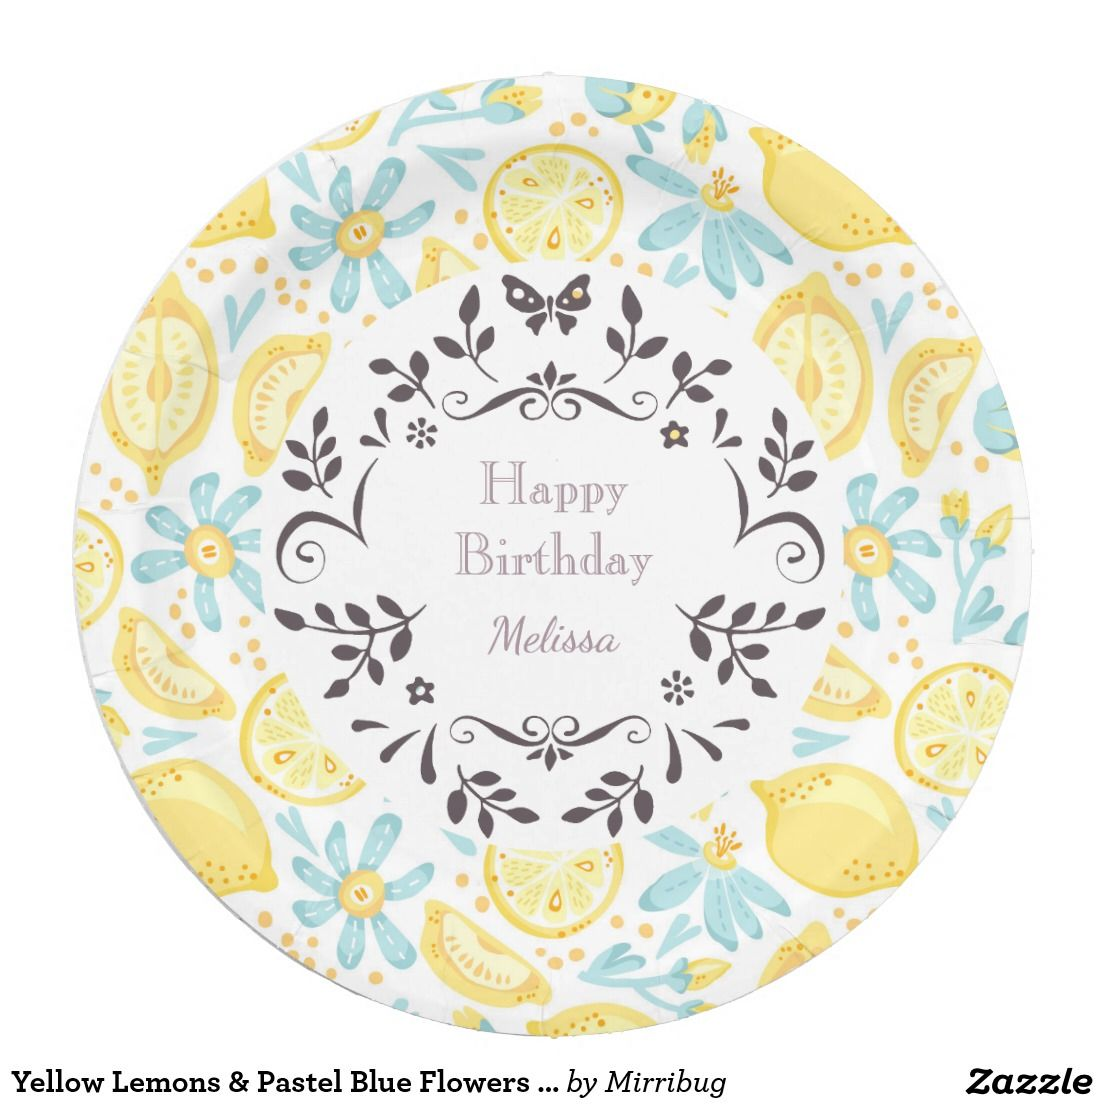 Yellow Lemons \u0026 Pastel Blue Flowers Happy Birthday Personalized Paper Plate  sc 1 st  Pinterest & Yellow Lemons \u0026 Pastel Blue Flowers Happy Birthday Personalized ...